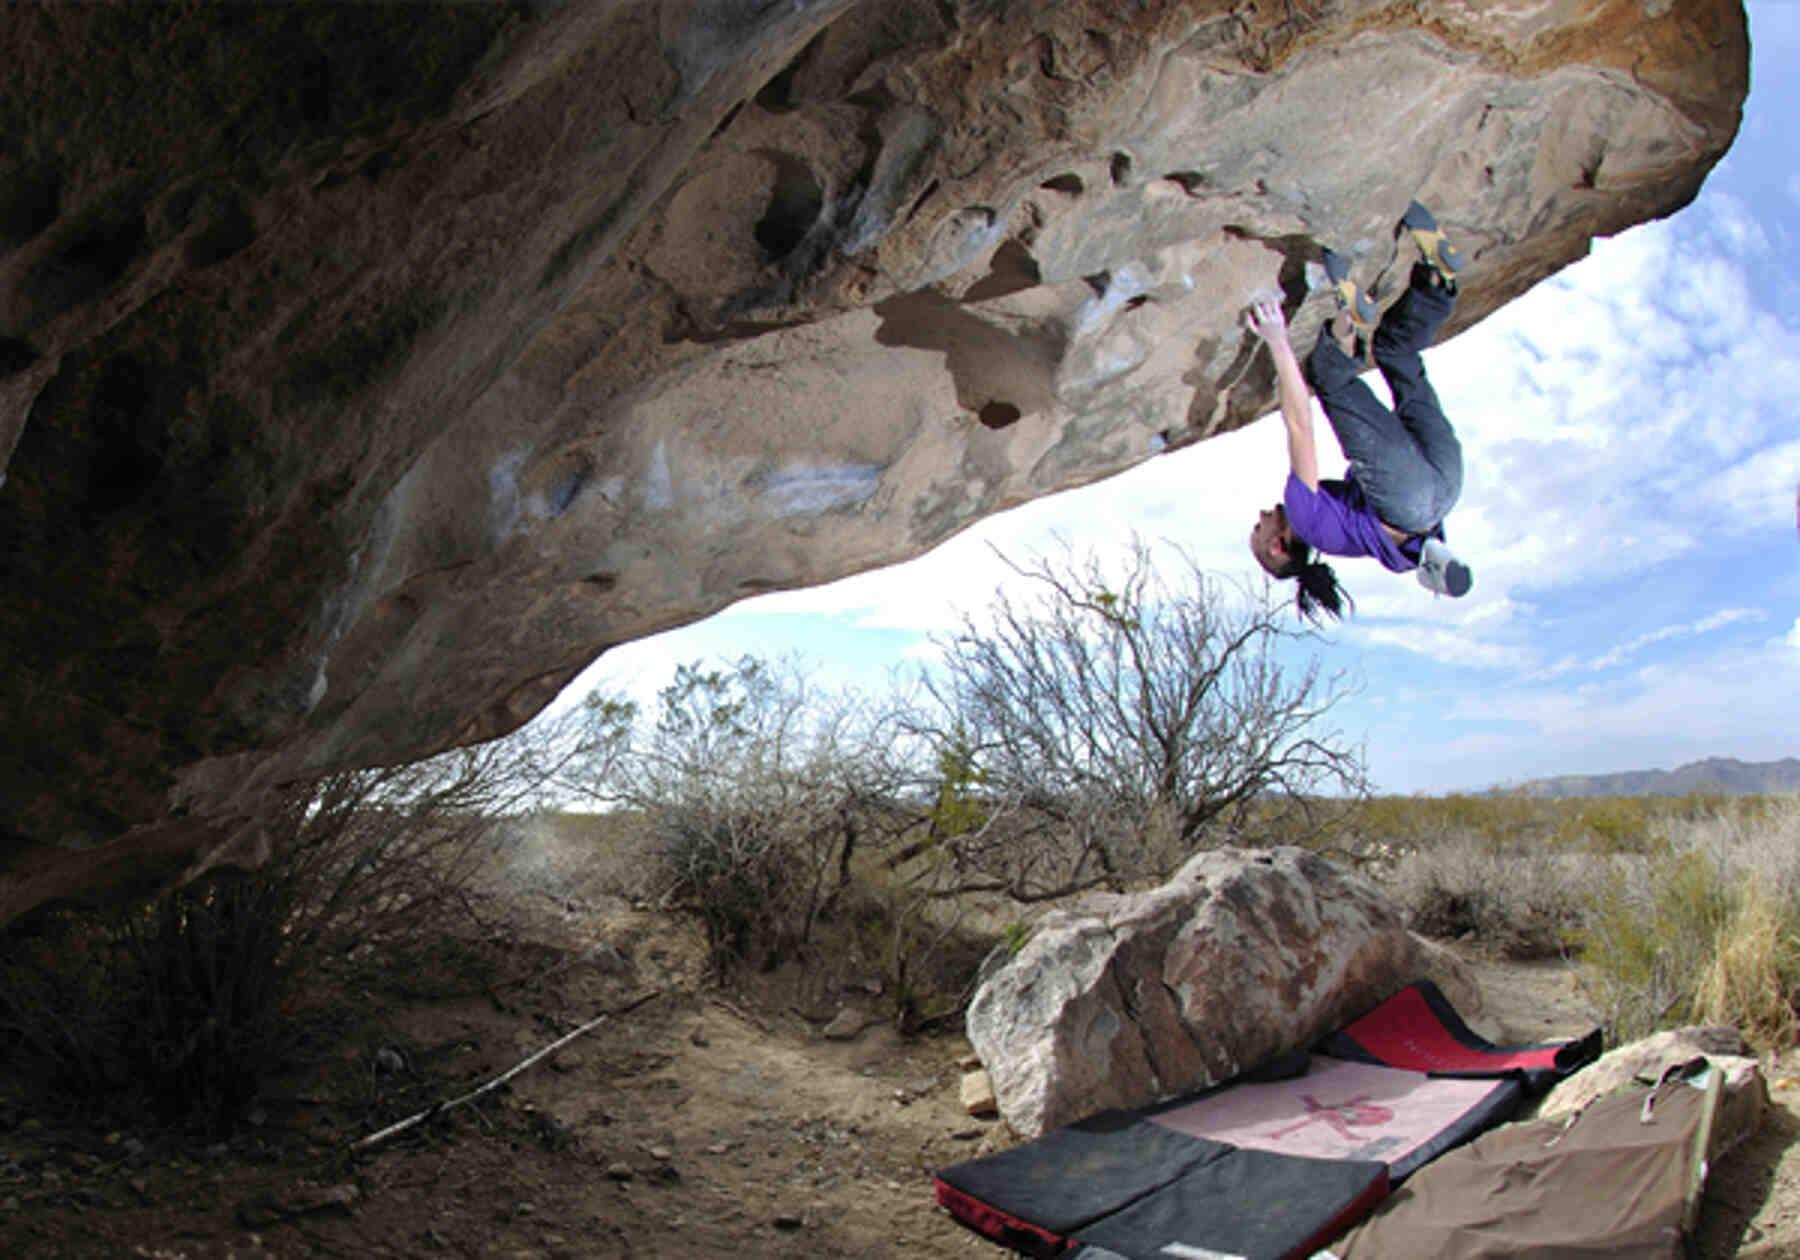 Jason Kehl - FrictionLabs Rock Climbing Chalk Pro Athlete